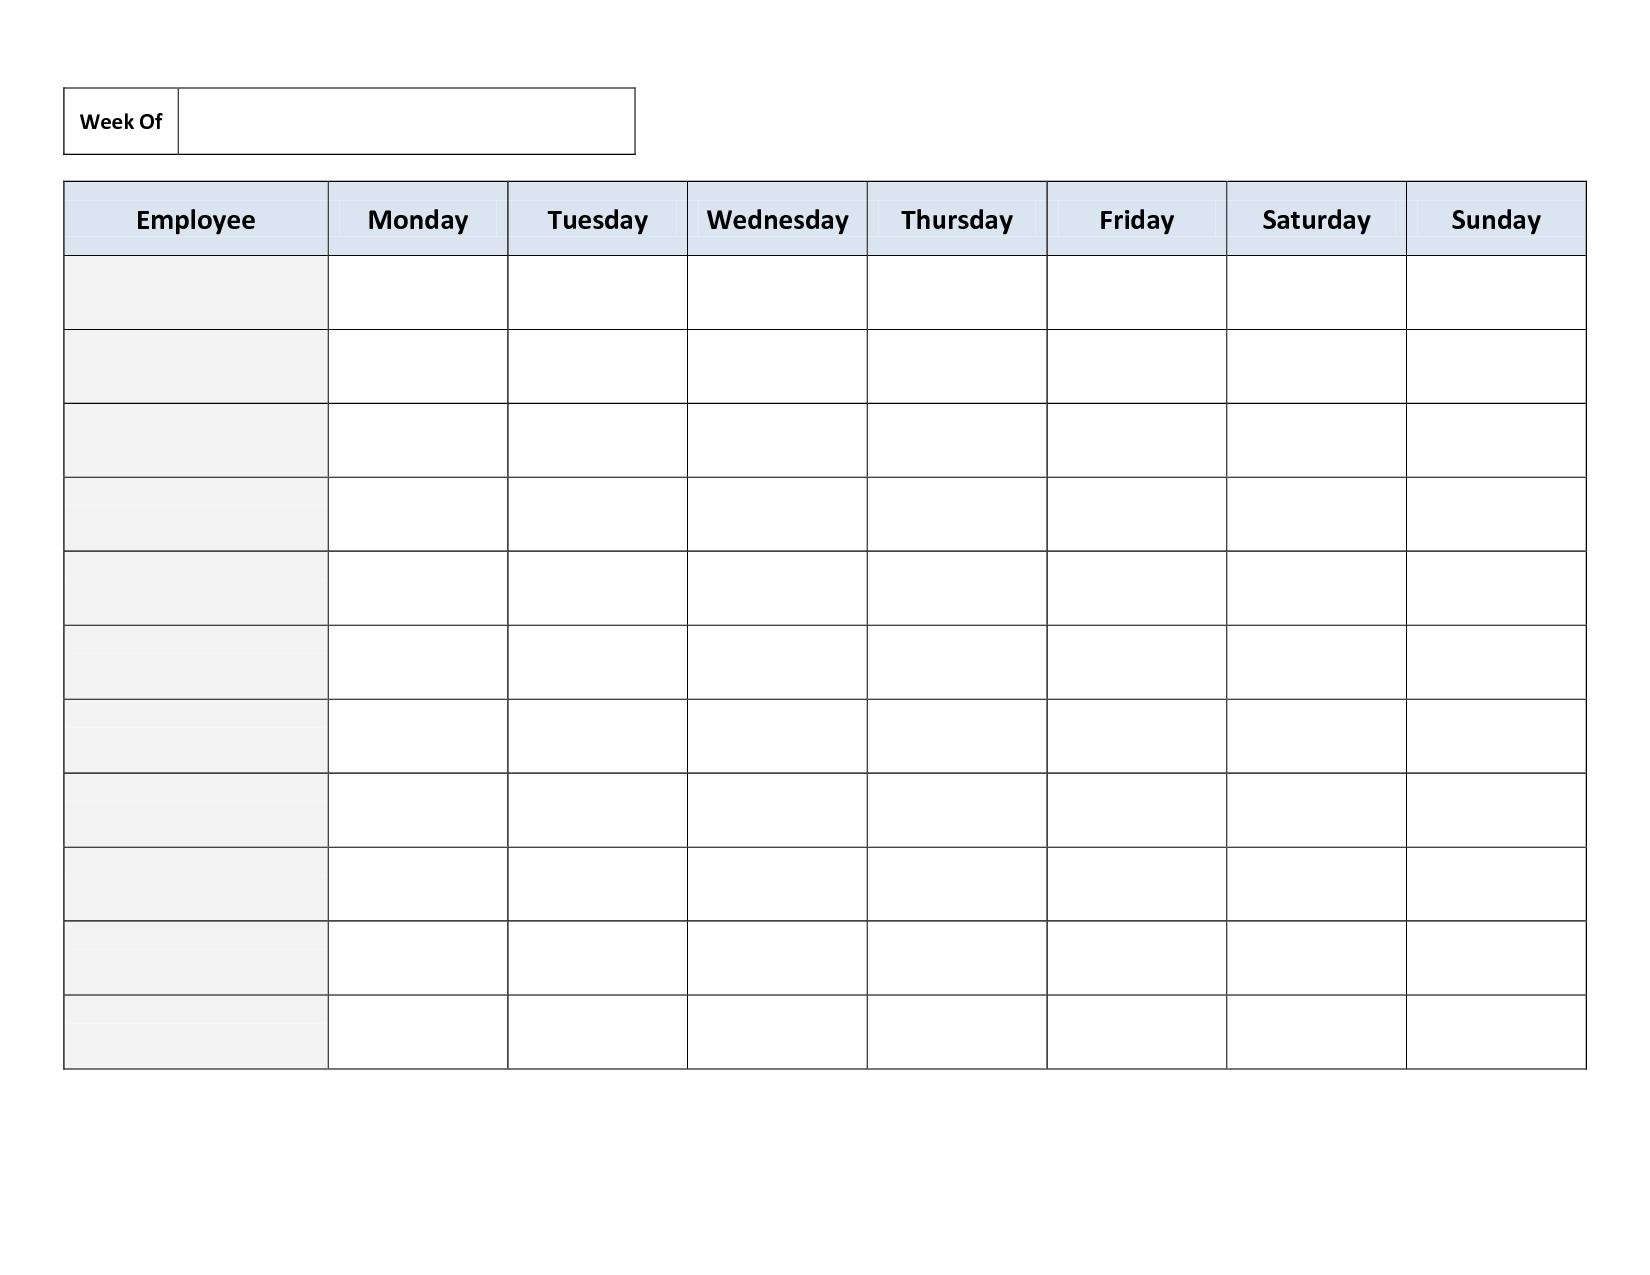 Blank Weekly Work Schedule Template   Schedule   Cleaning Schedule - Free Printable Weekly Schedule